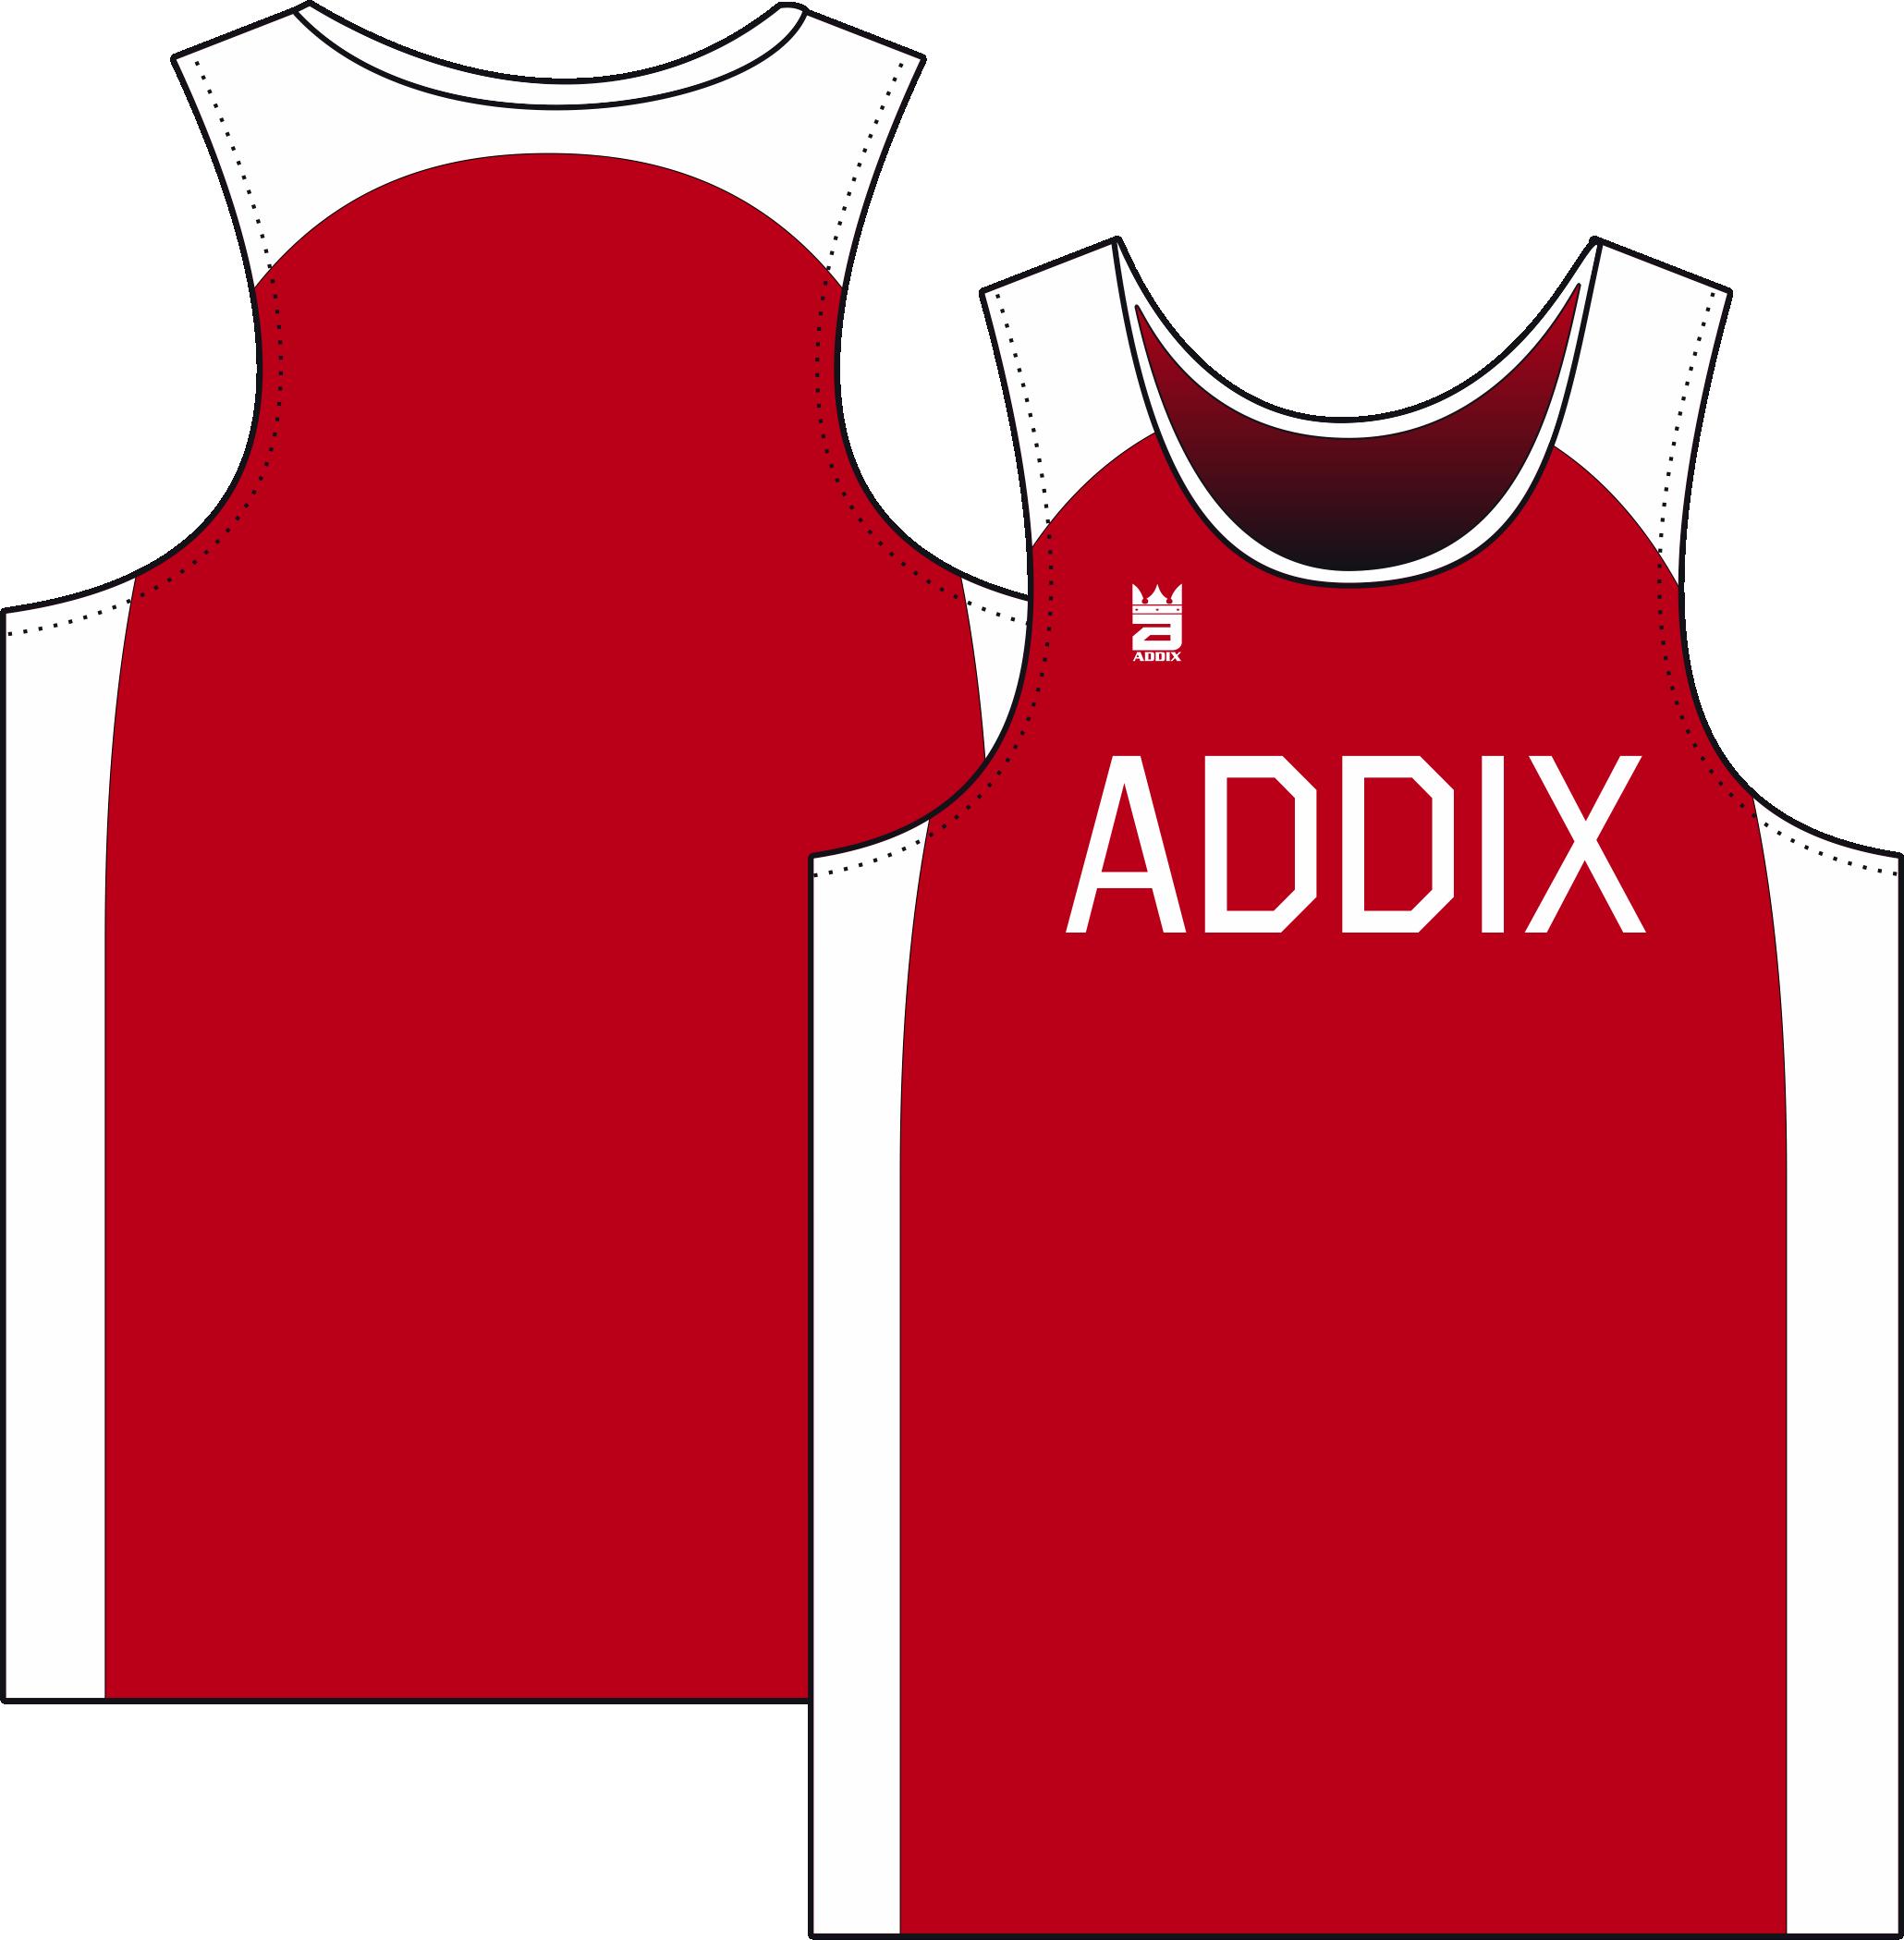 ADDIX SPLIT TIME